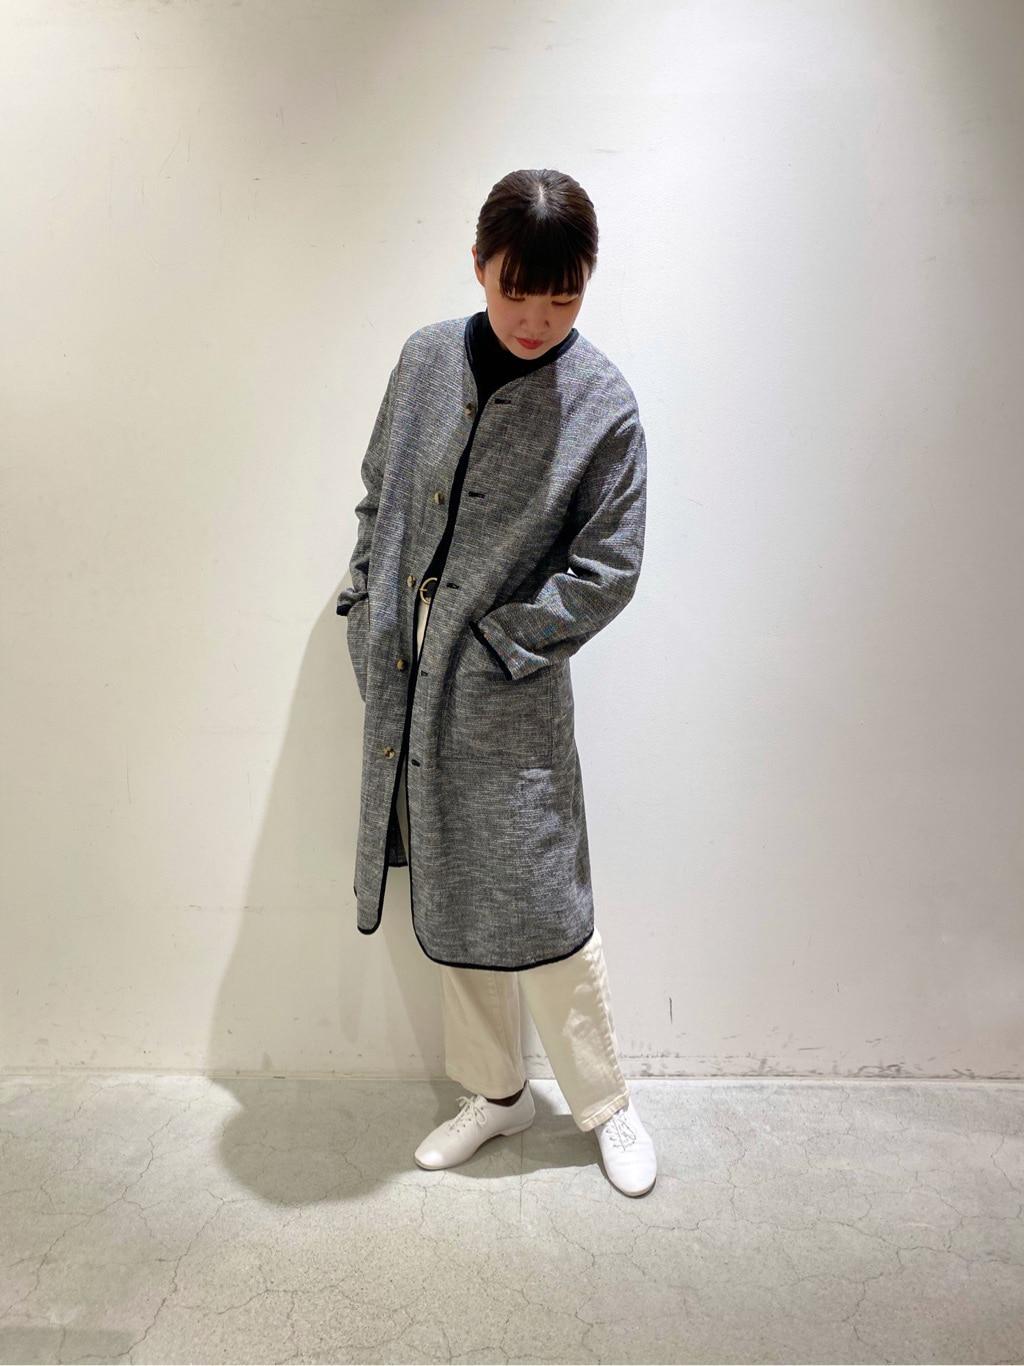 yuni 神戸路面 身長:166cm 2021.03.05